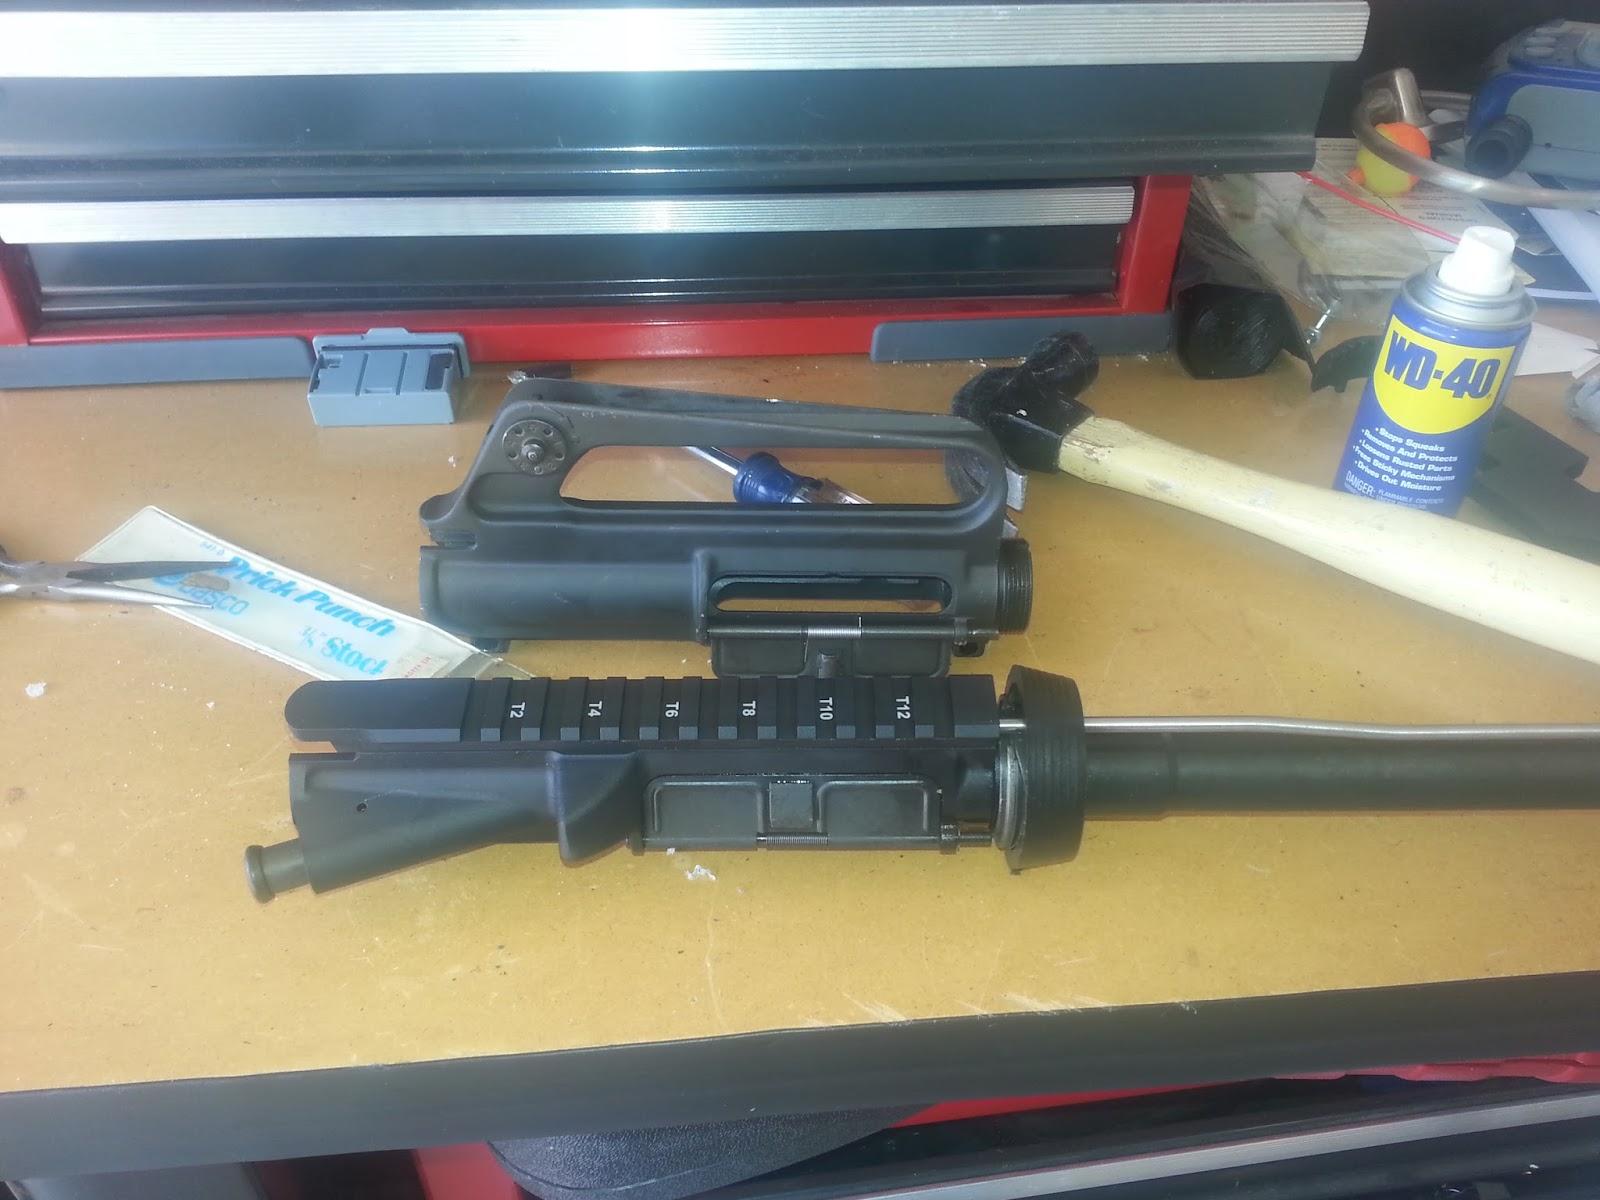 Best Woodworking Plans And Guide: Folding Gun Rack Plans Wooden Plans